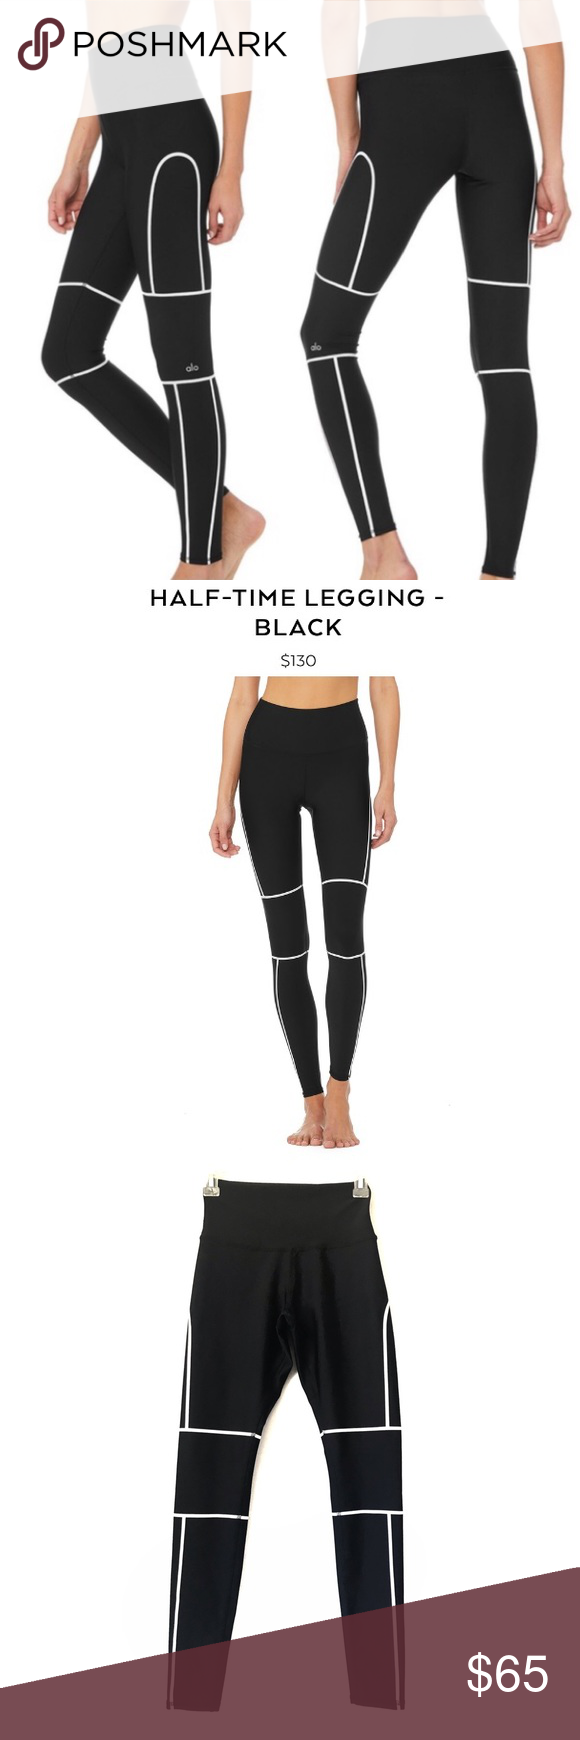 c3ae227361 ALO YOGA HALF-TIME LEGGING - BLACK Contour and sculpt with Half-Time Legging